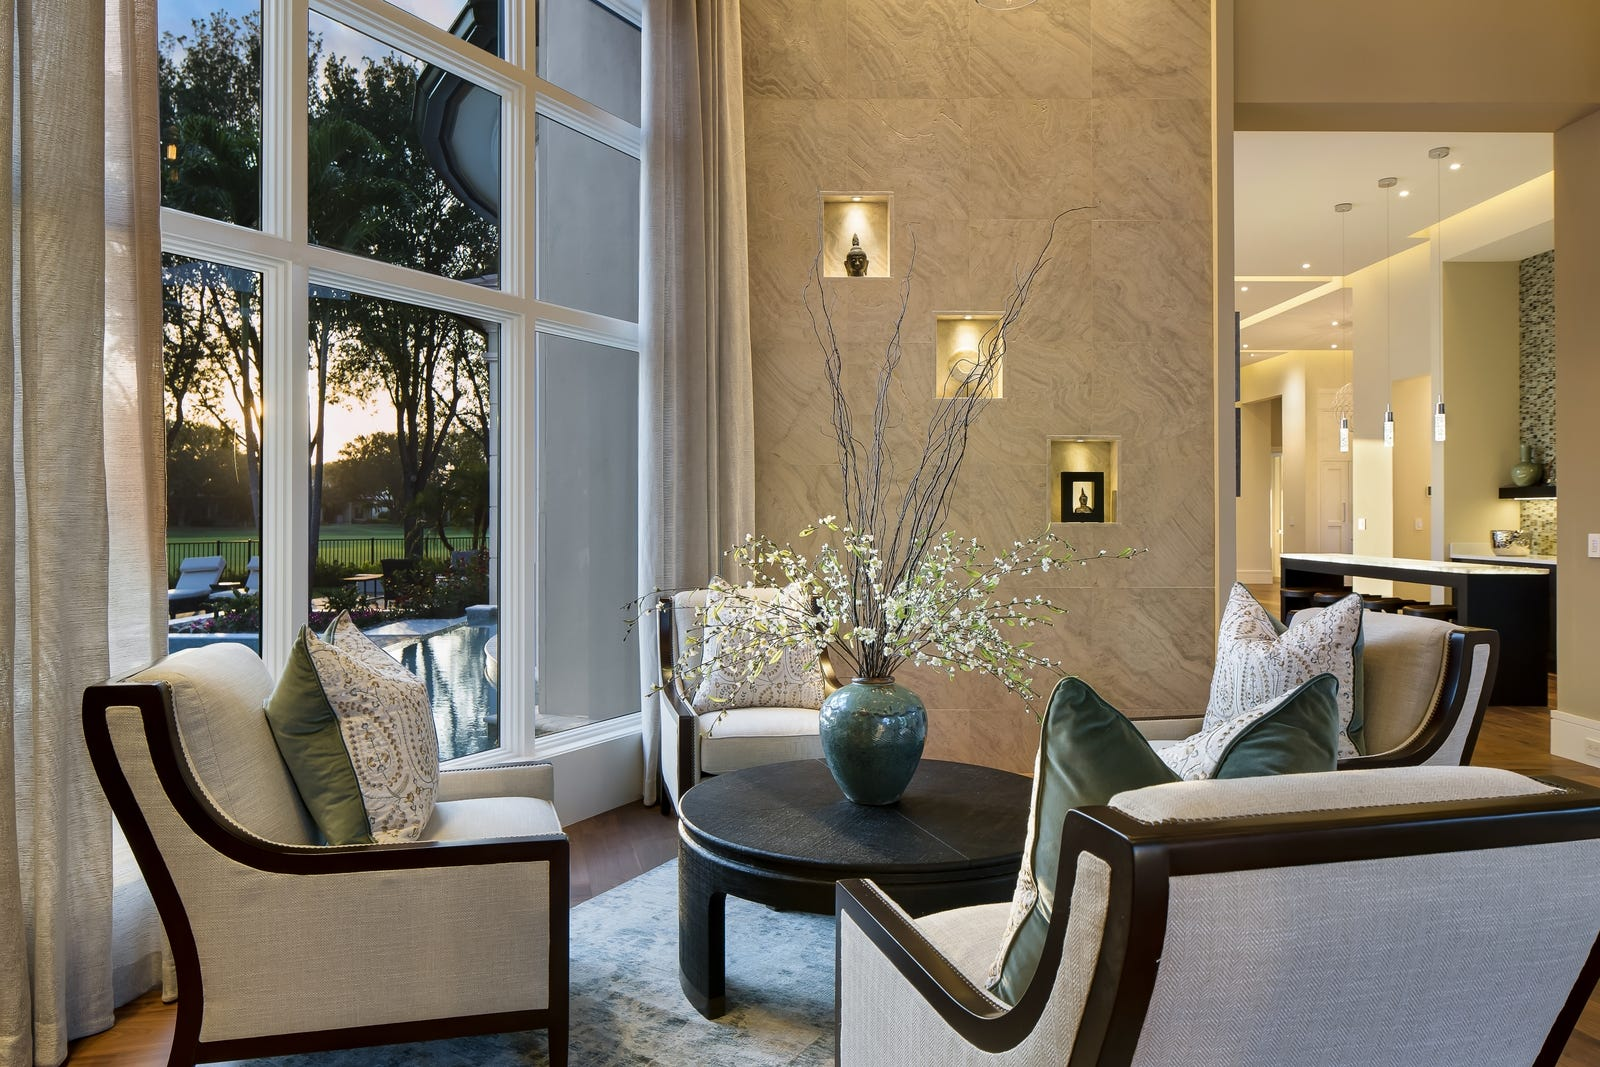 Furniture Schedule Interior Design ~ Theory design awarded interior design contracts for seagate models